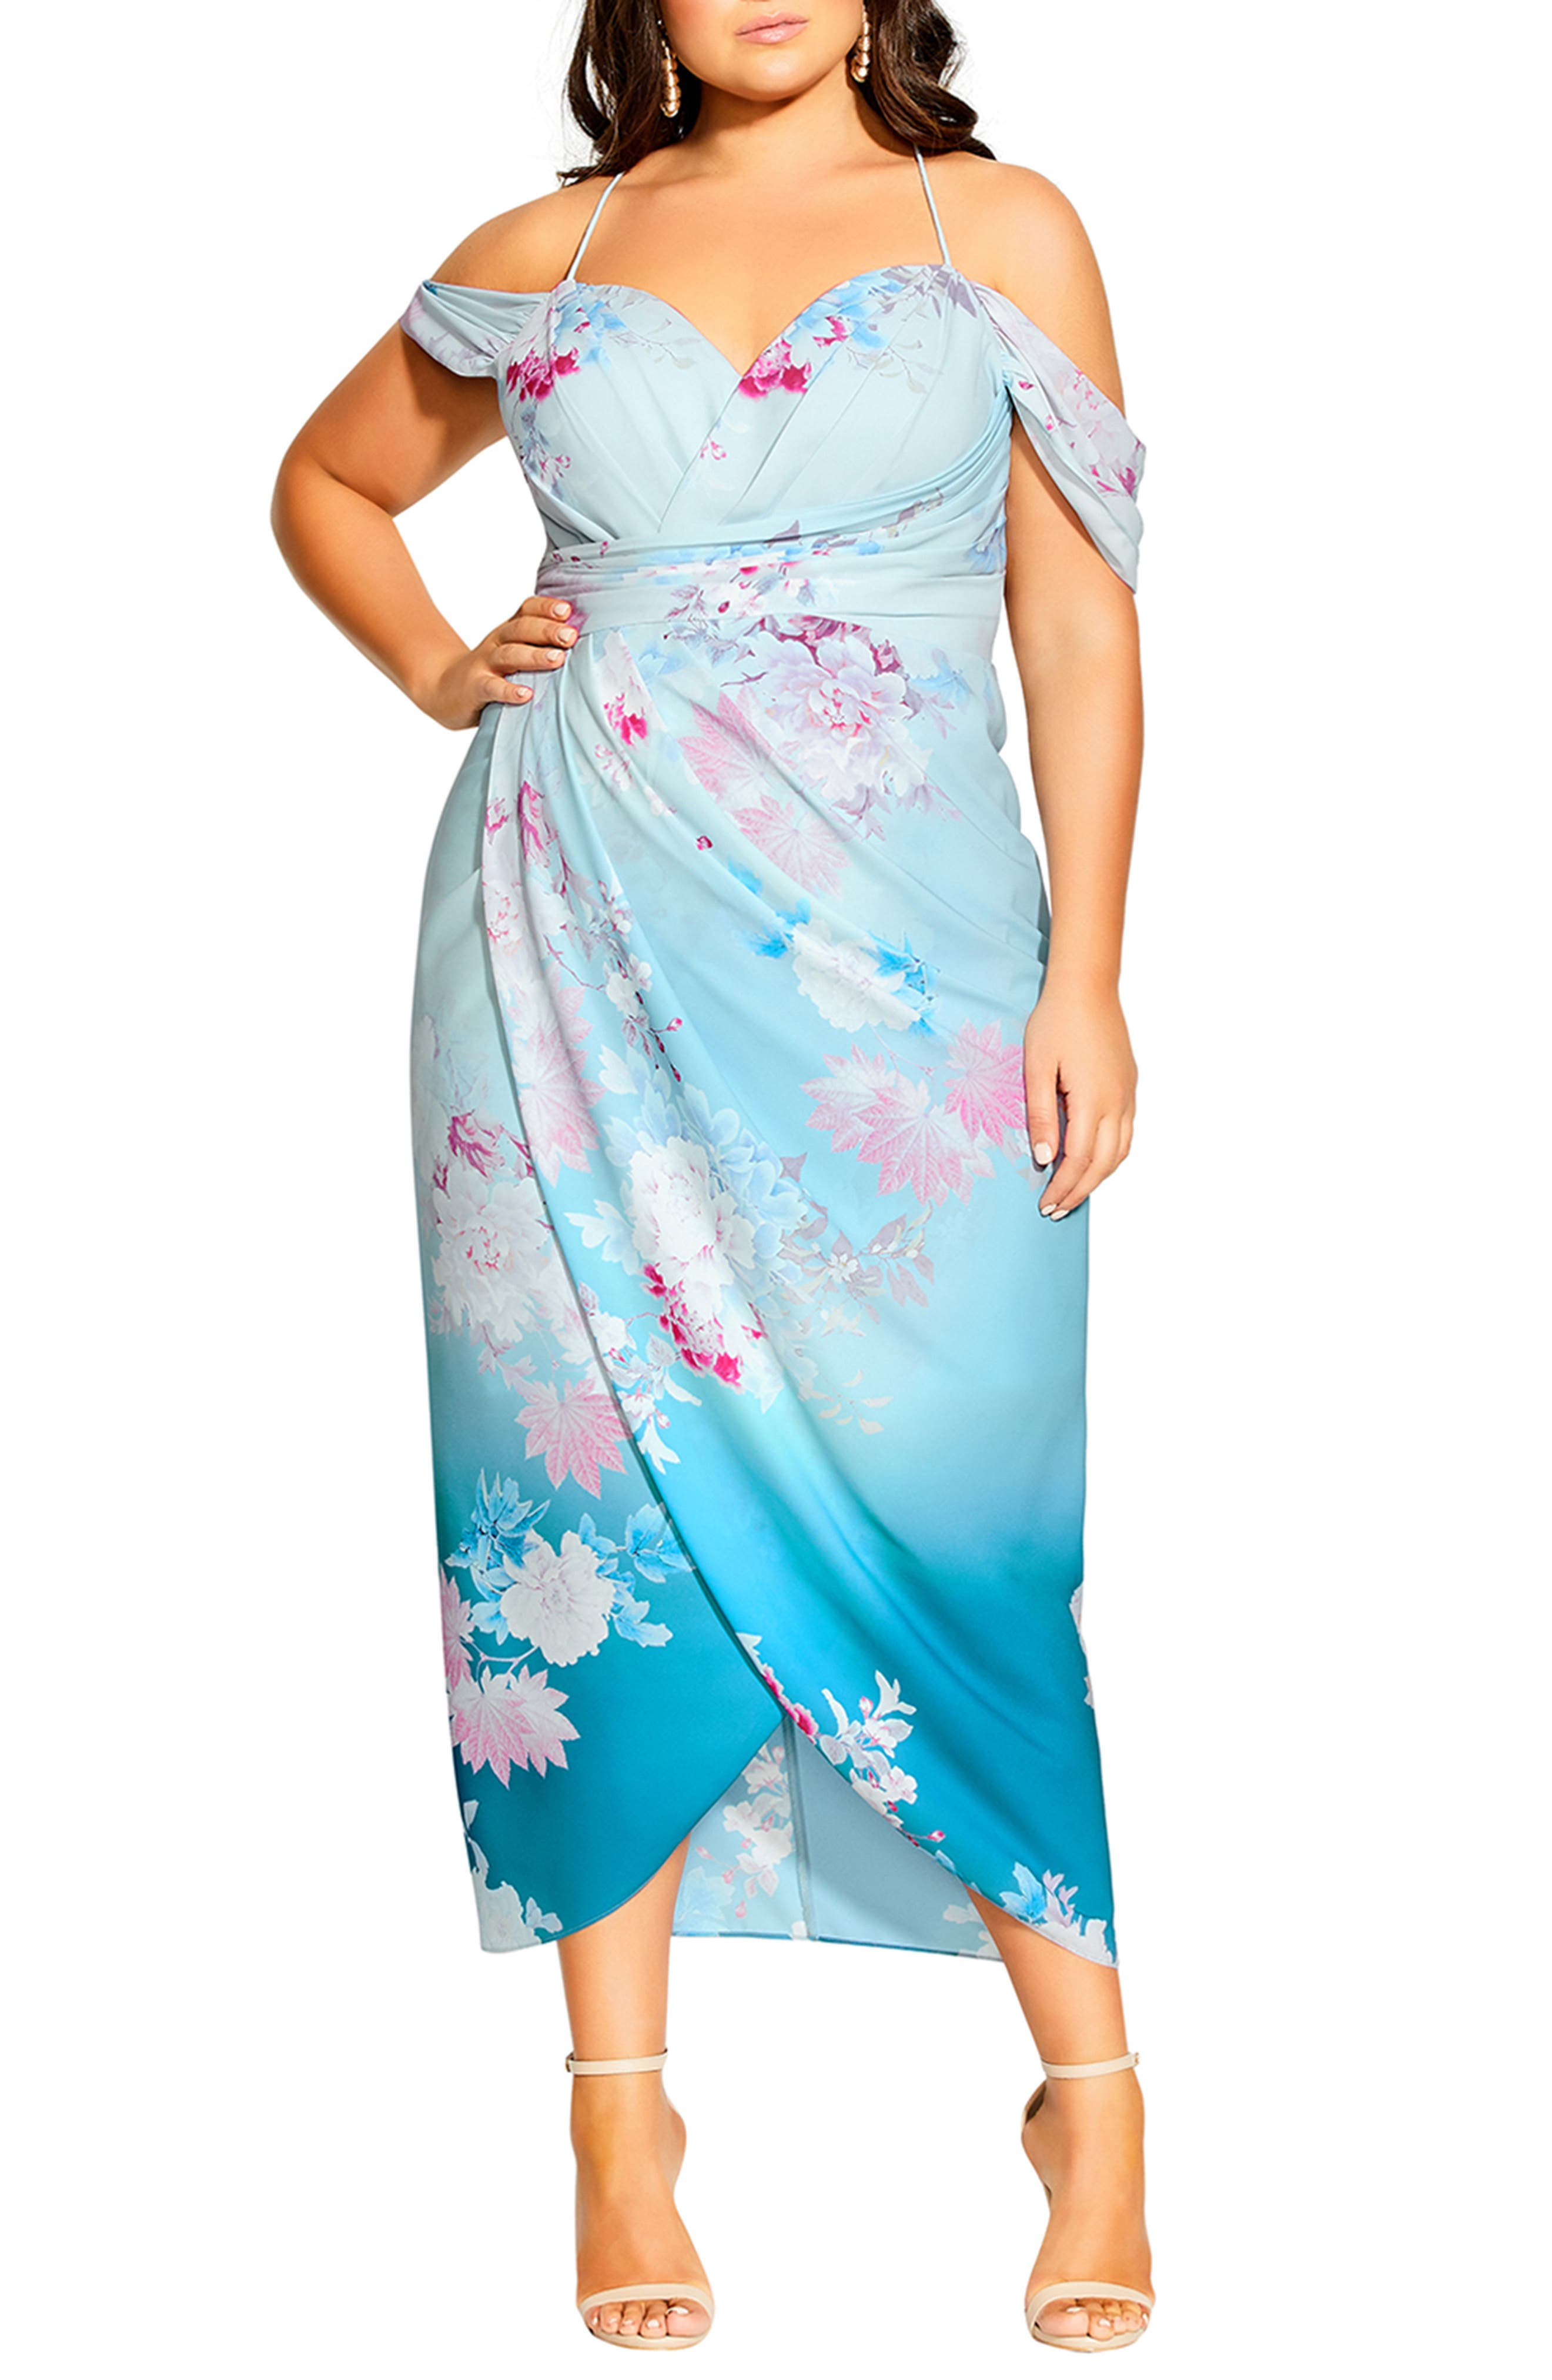 Tsubaki Twine Floral Cold Shoulder Dress